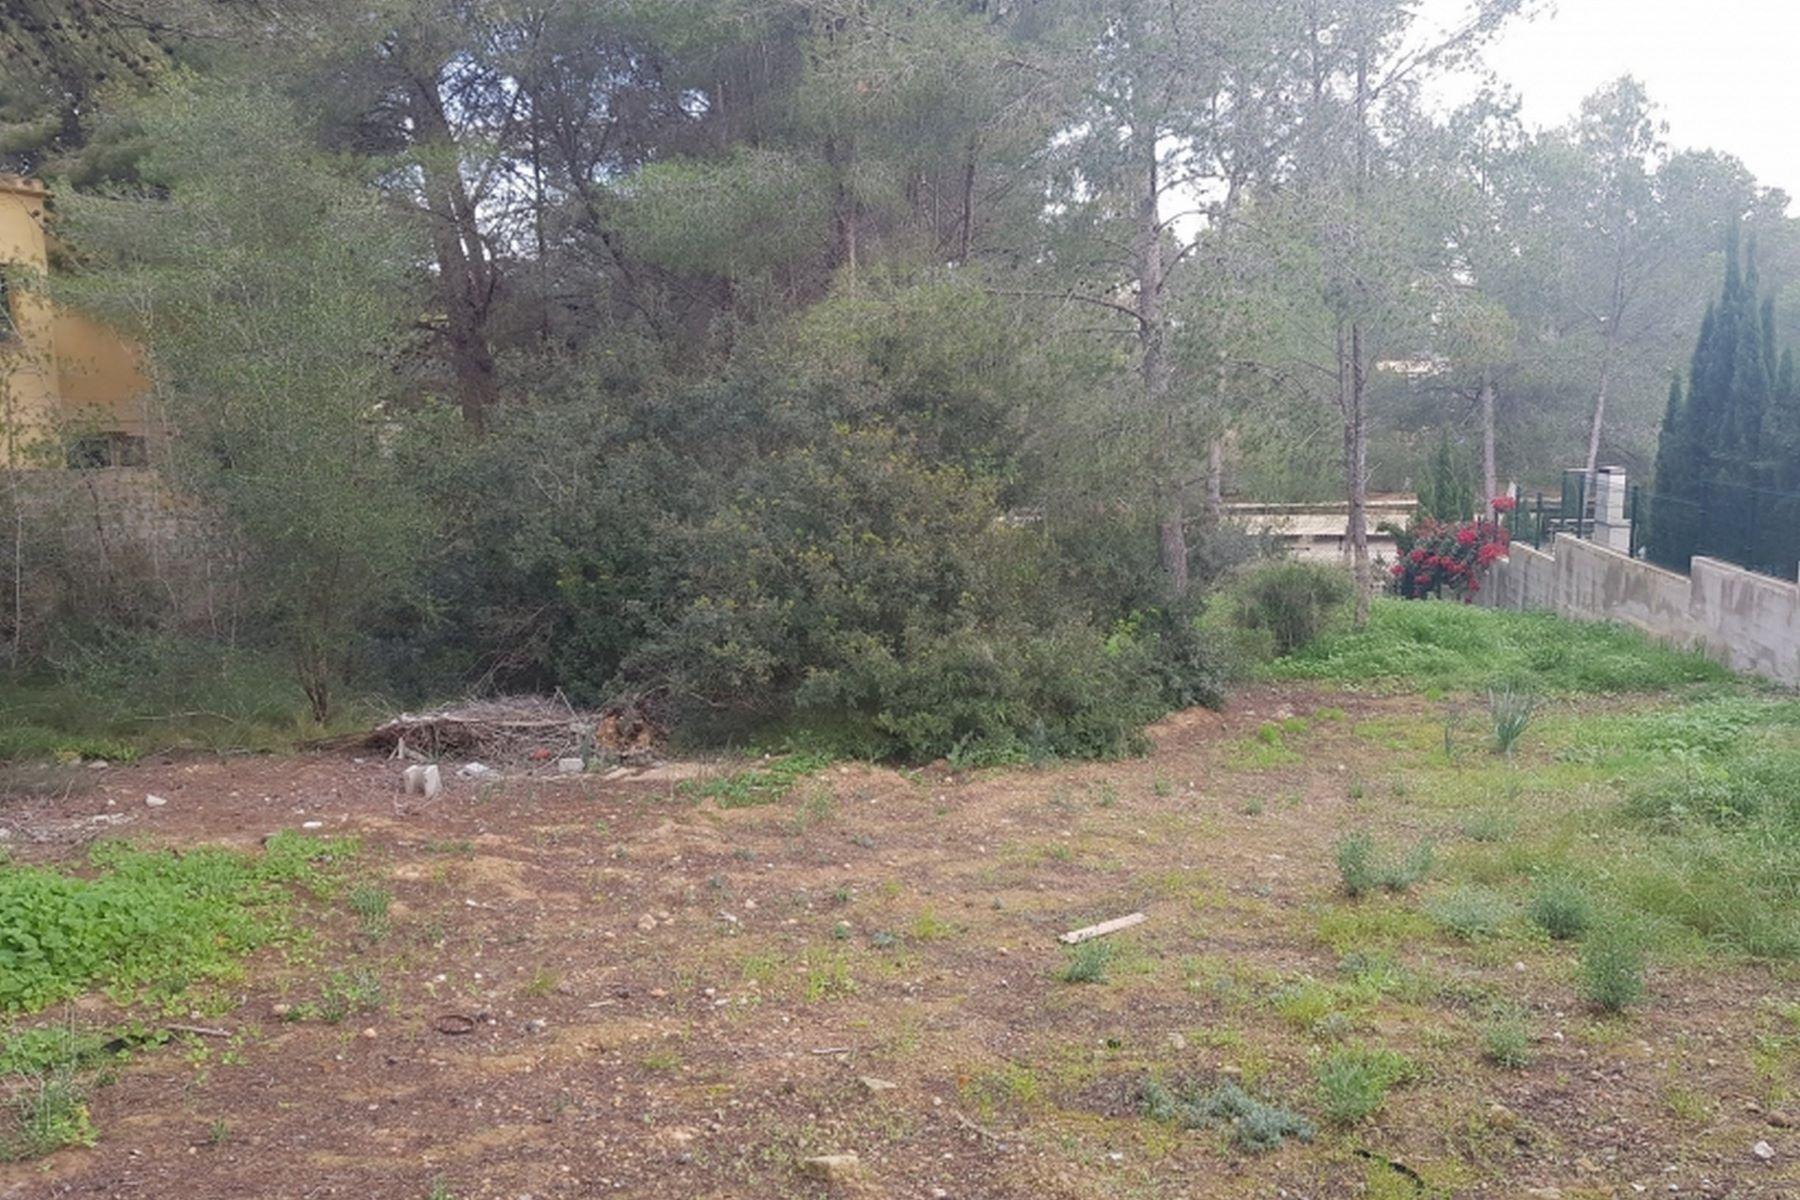 Land for Sale at Plot near the Yacht Club and the beach Nova Santa Ponsa, Mallorca Spain